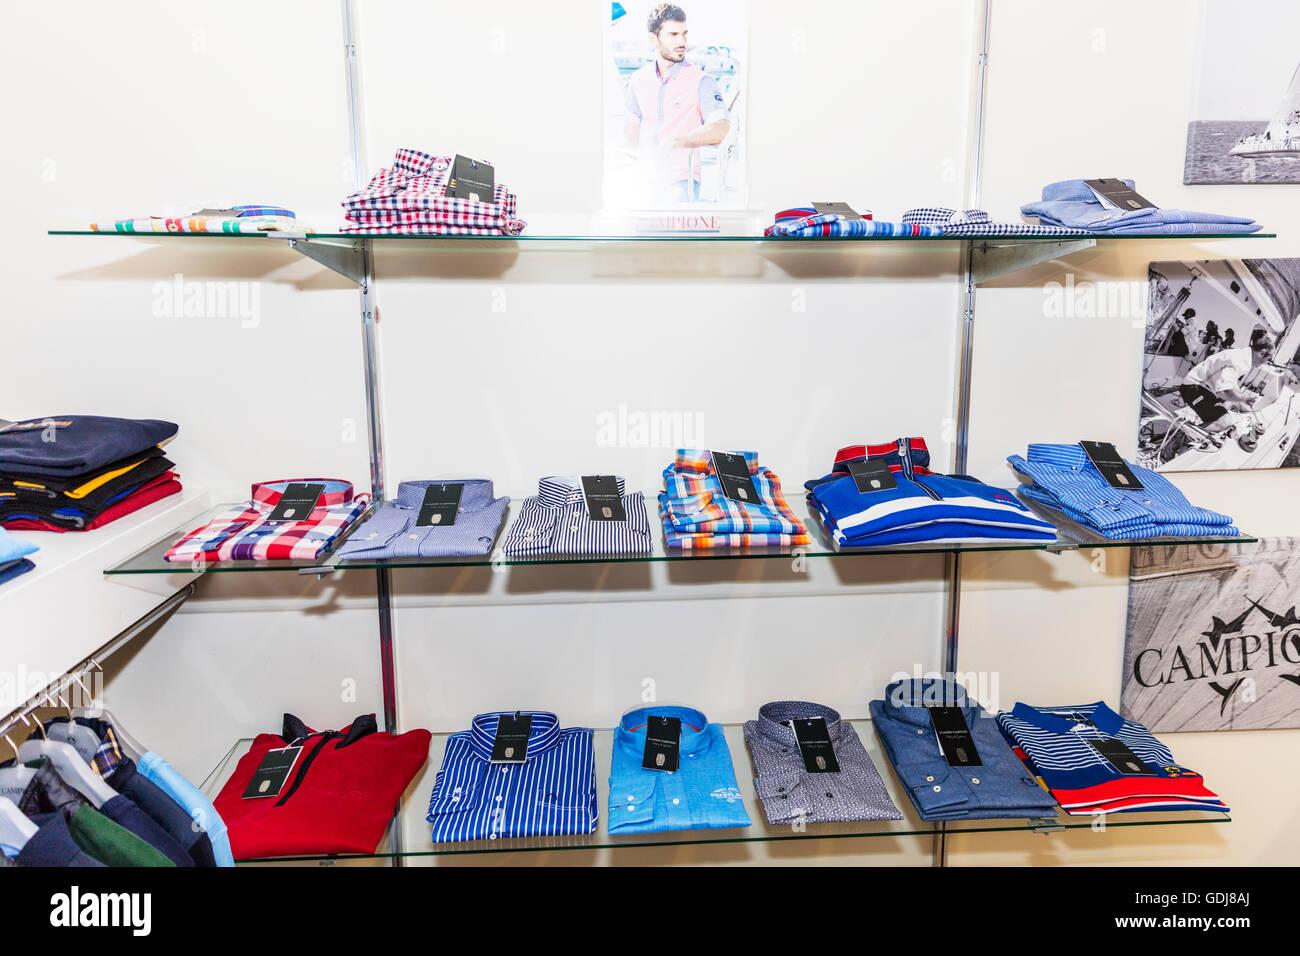 Shirts on shelf in clothes shop display displaying shirts for men to choose shirt on shelve UK England - Stock Image